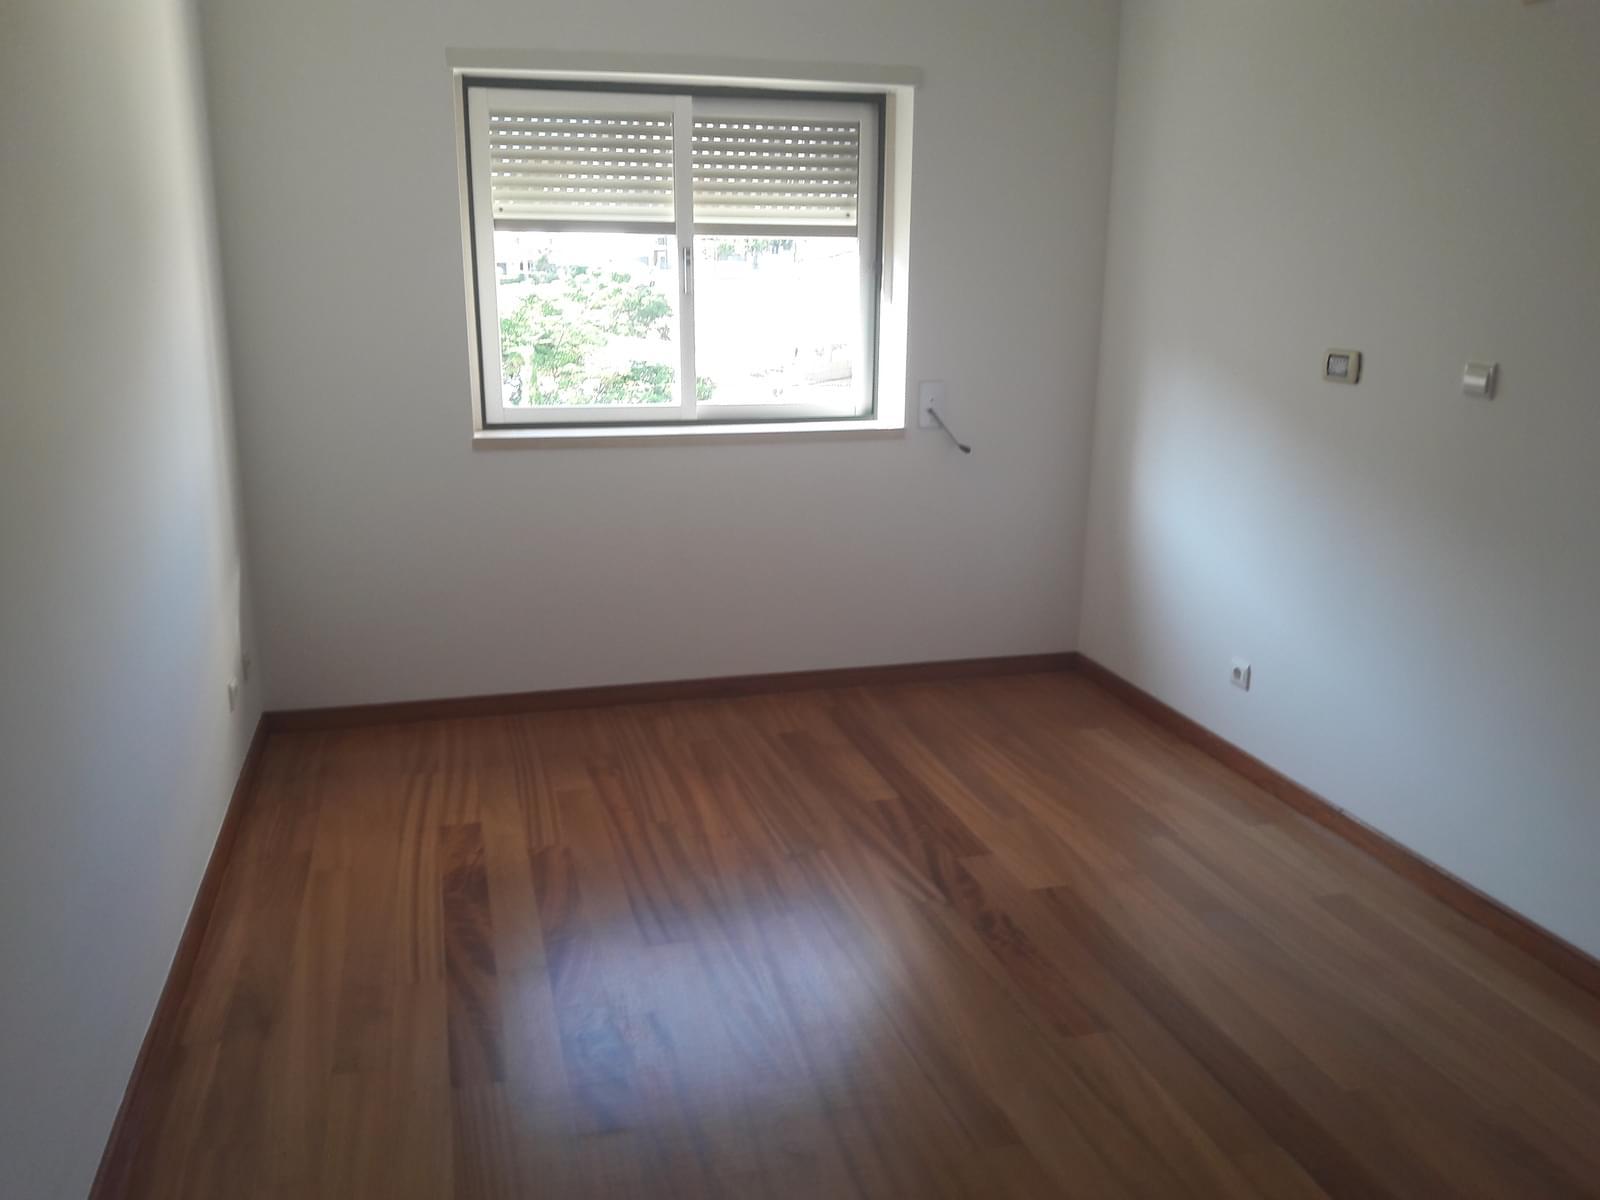 pf18038-apartamento-t3-11b8e584-685a-4b8a-b346-71956977267b